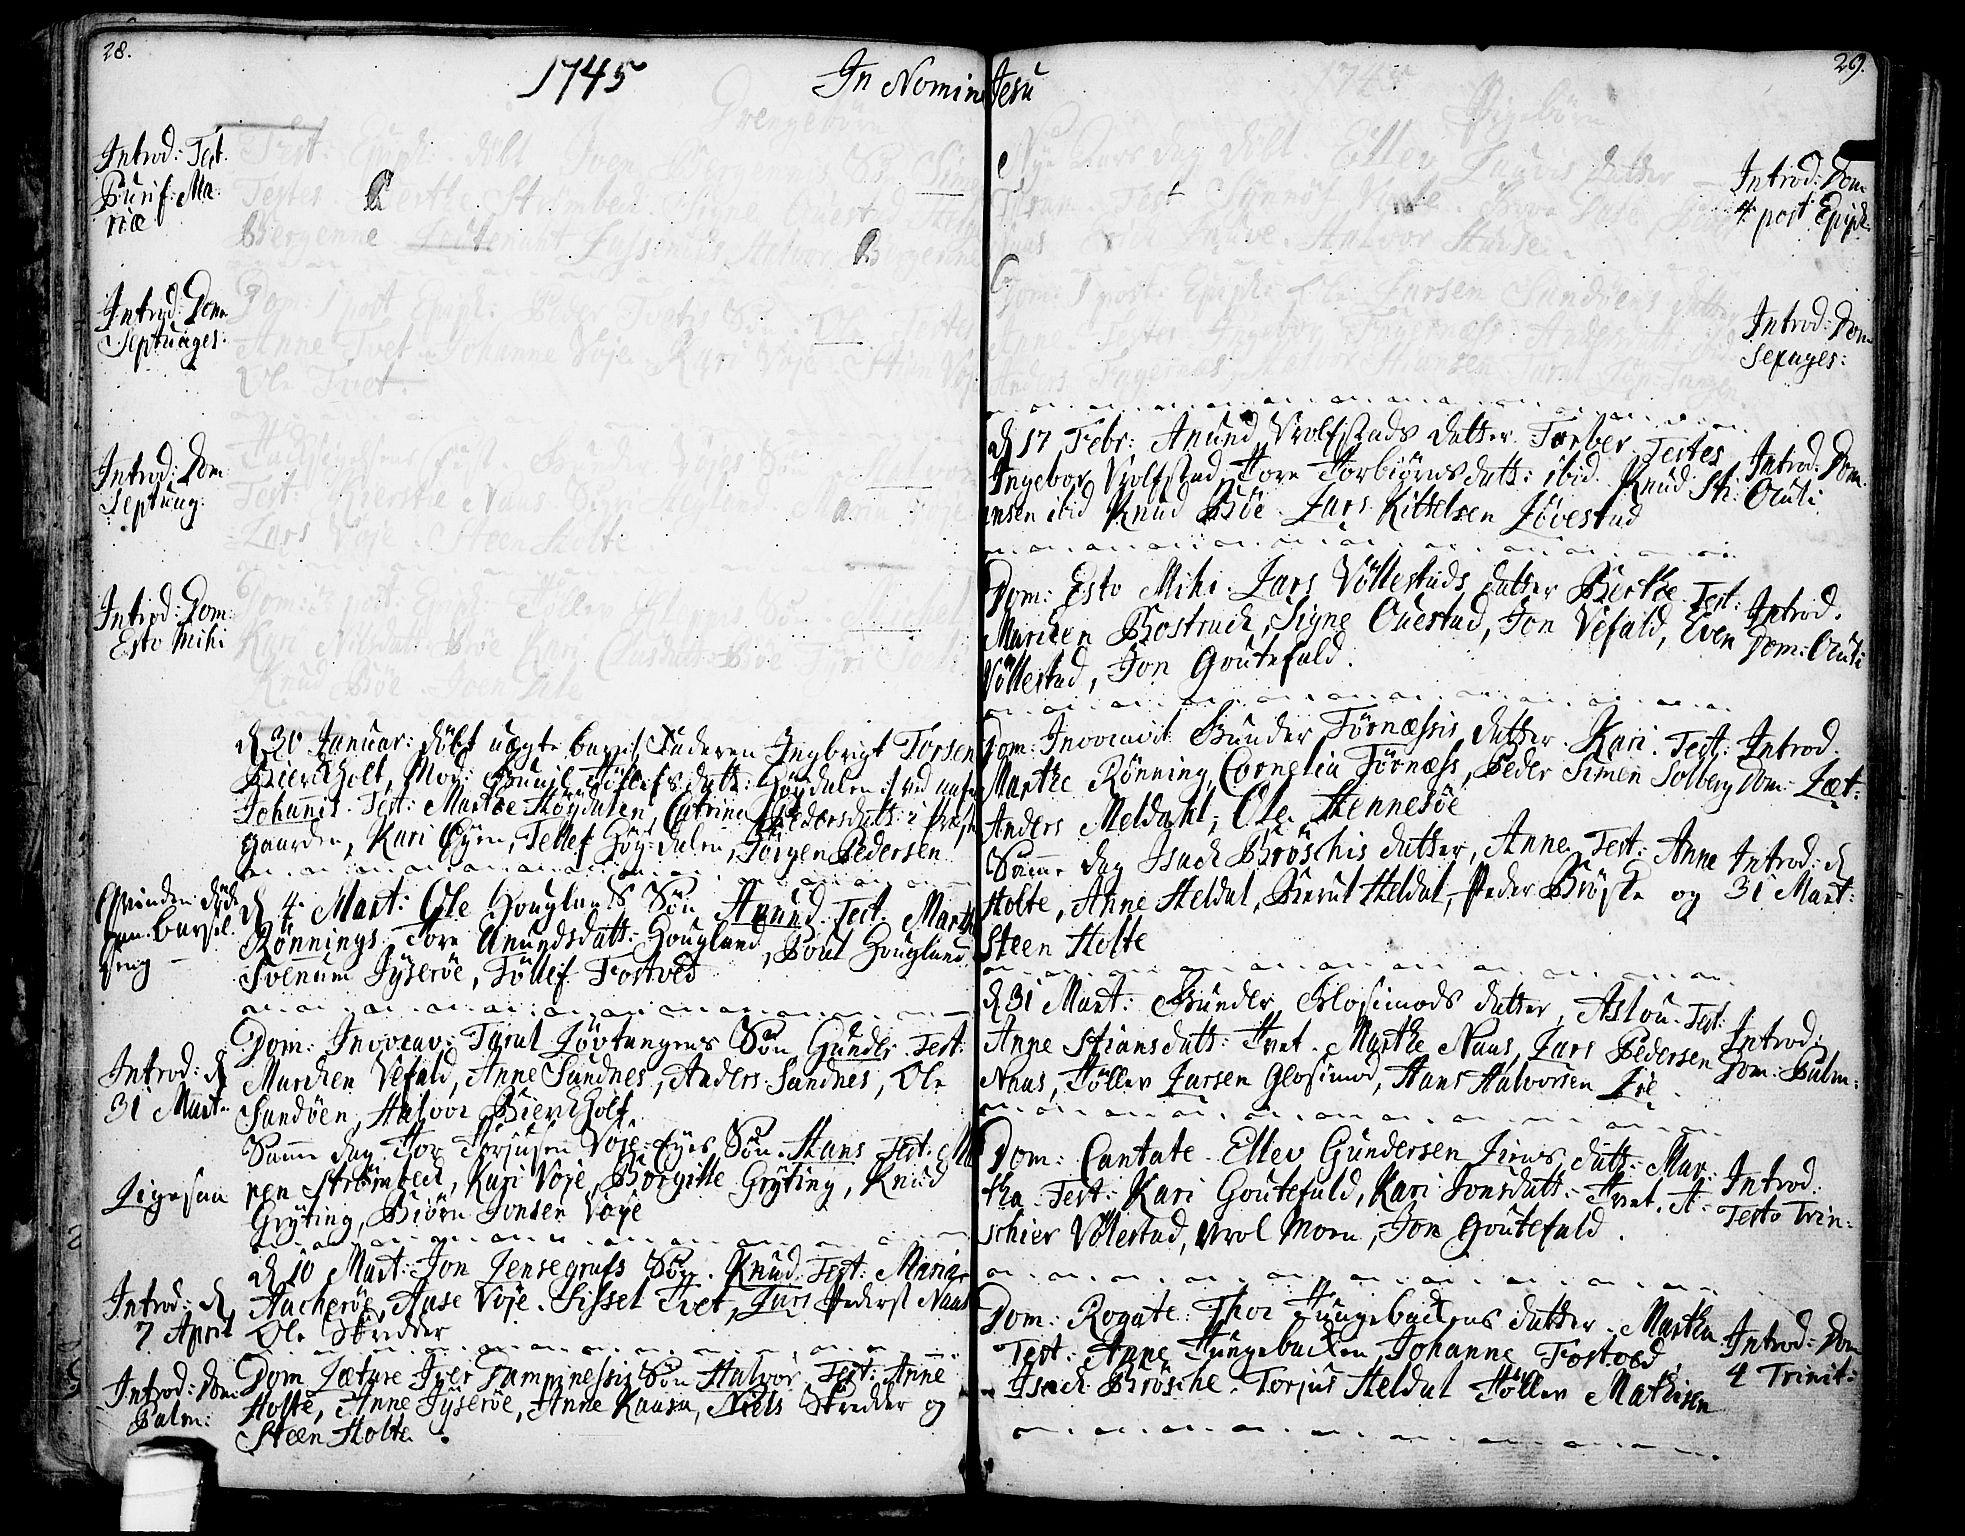 SAKO, Drangedal kirkebøker, F/Fa/L0001: Ministerialbok nr. 1, 1697-1767, s. 28-29